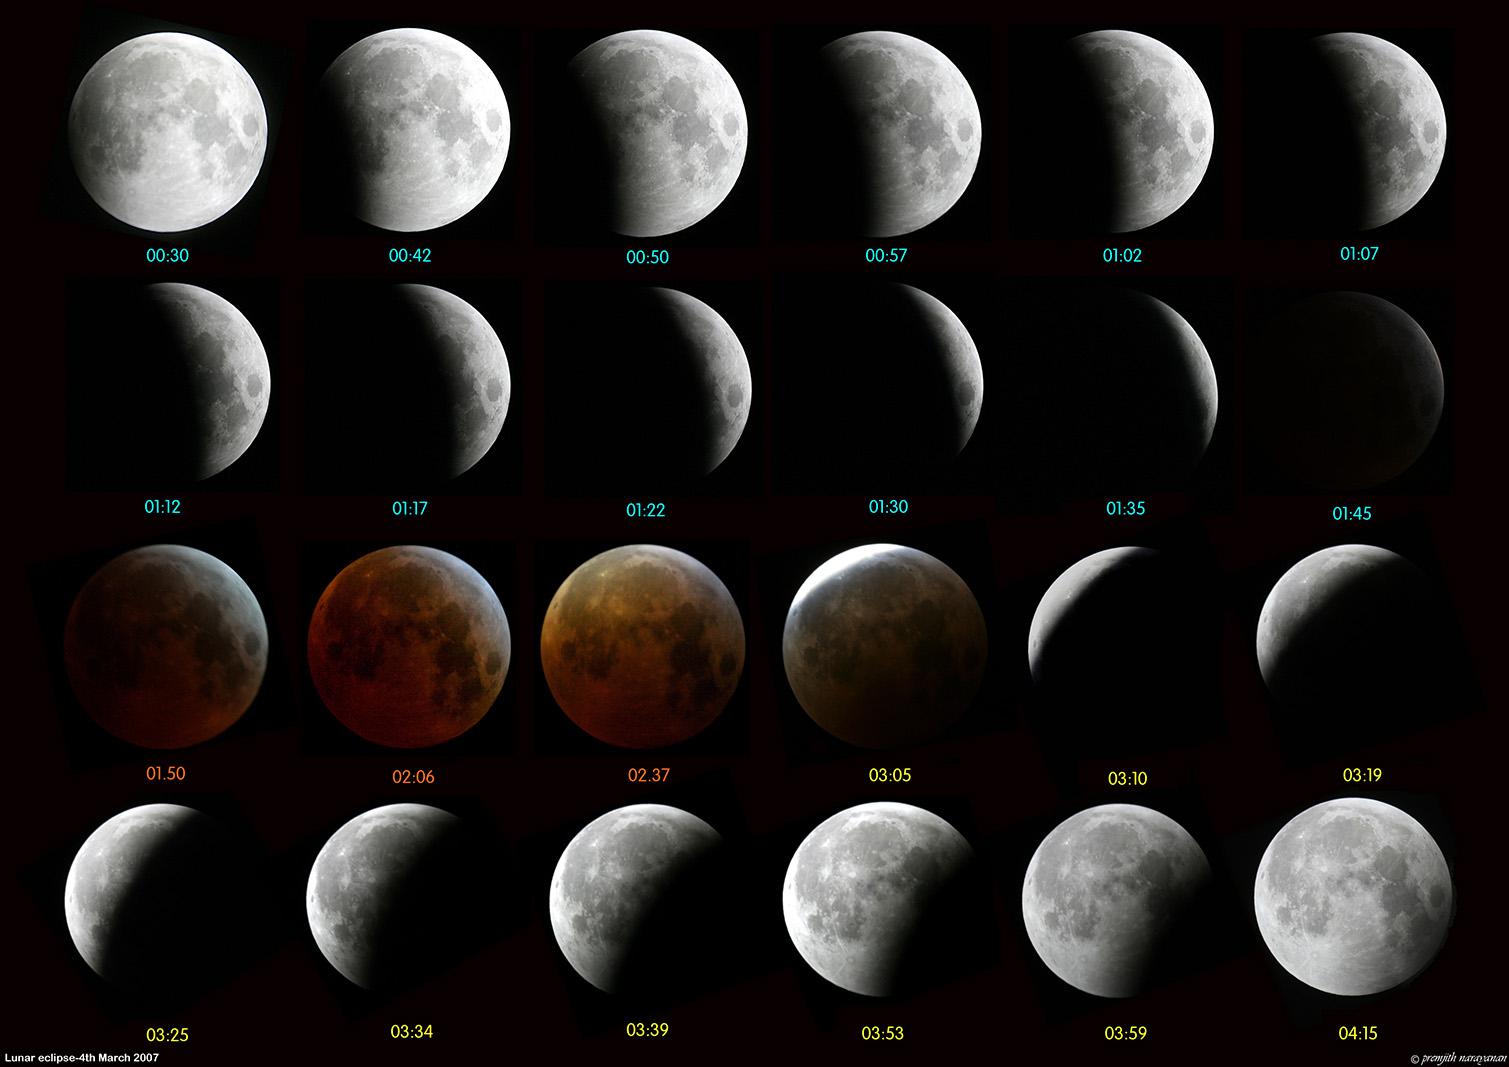 LUNAR eclipse 4th march 2007